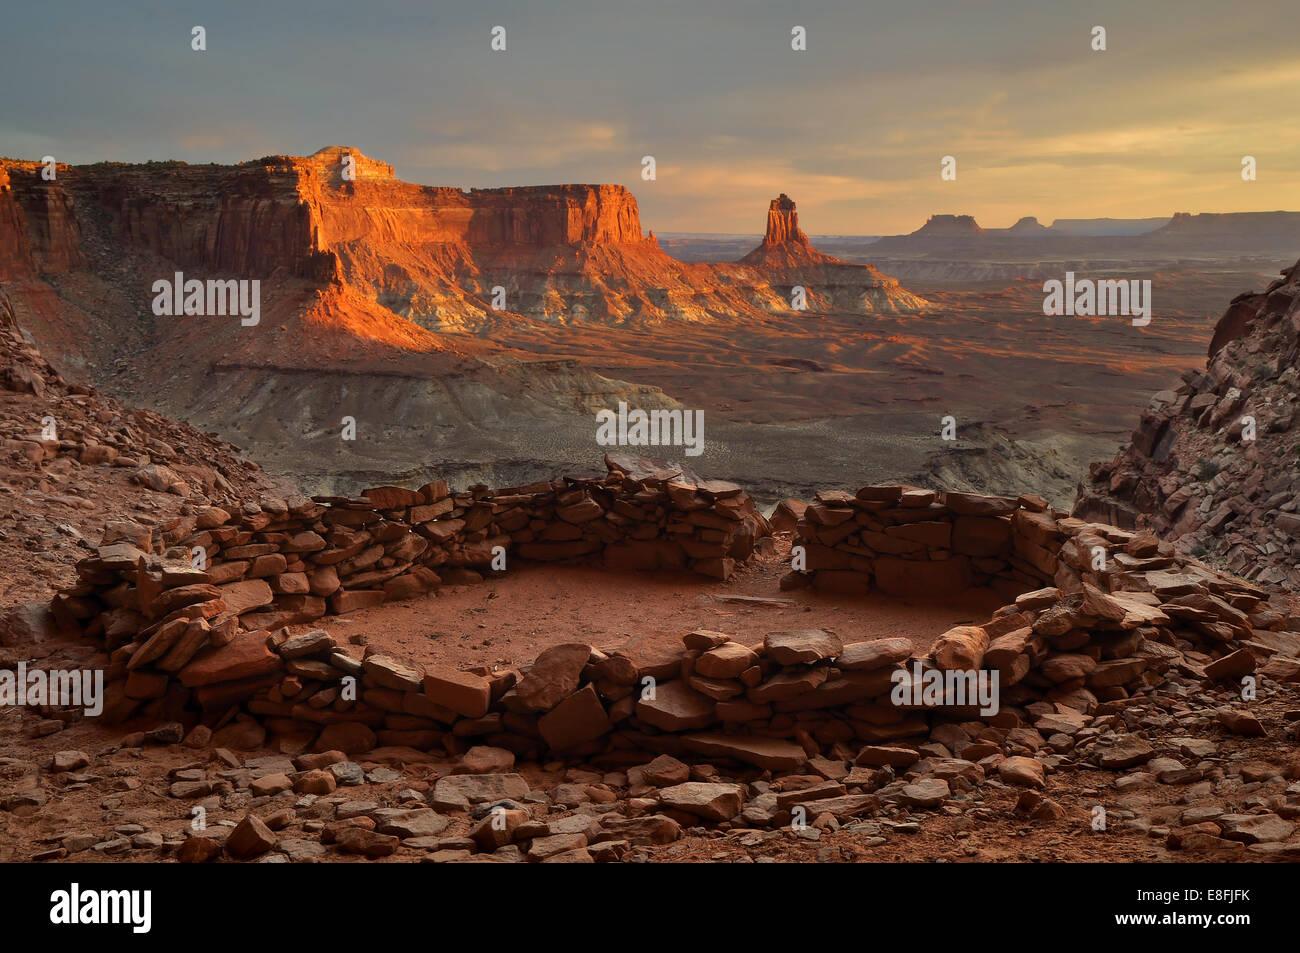 USA, Utah, Canyonlands National Park, View of False Kiva at Sunset - Stock Image